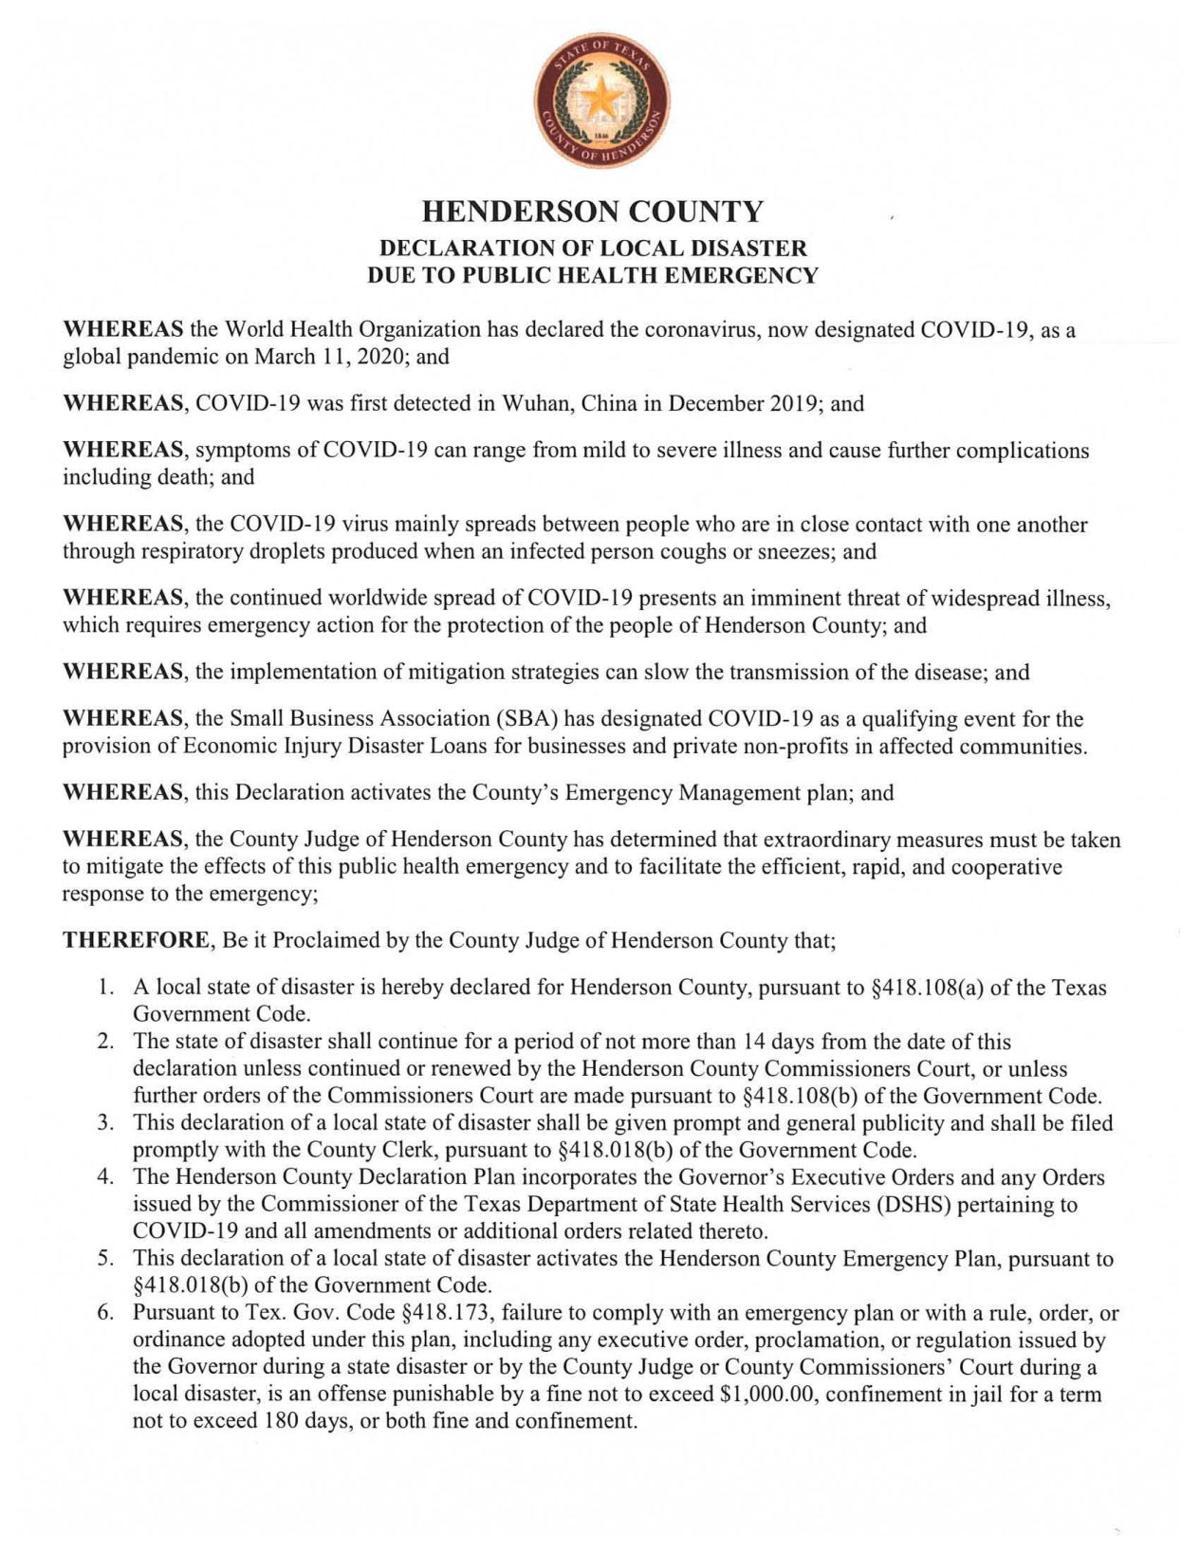 Emergency Declaration_Page_1.jpg